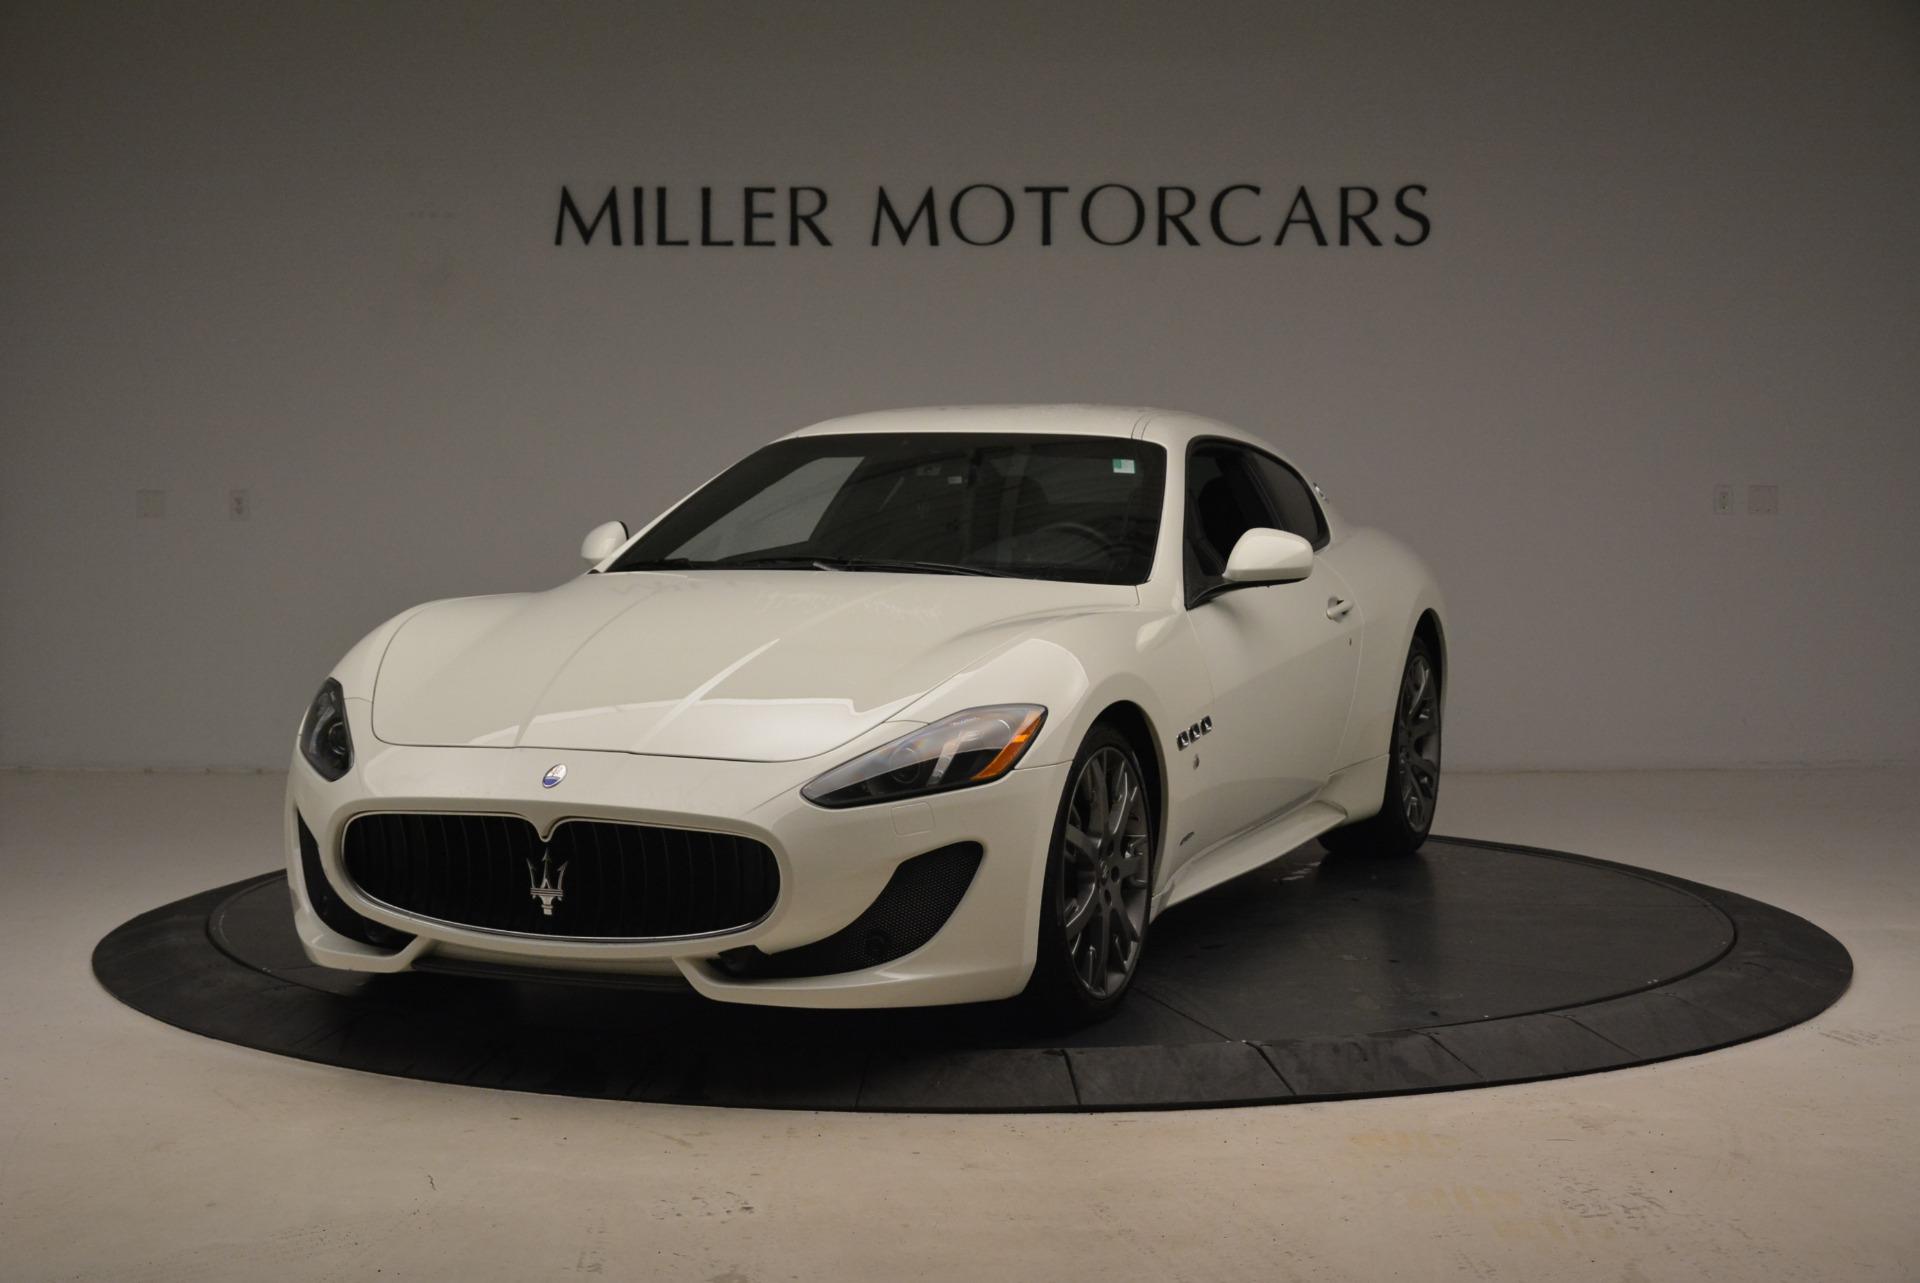 Used 2016 Maserati GranTurismo Sport for sale $61,900 at Maserati of Westport in Westport CT 06880 1